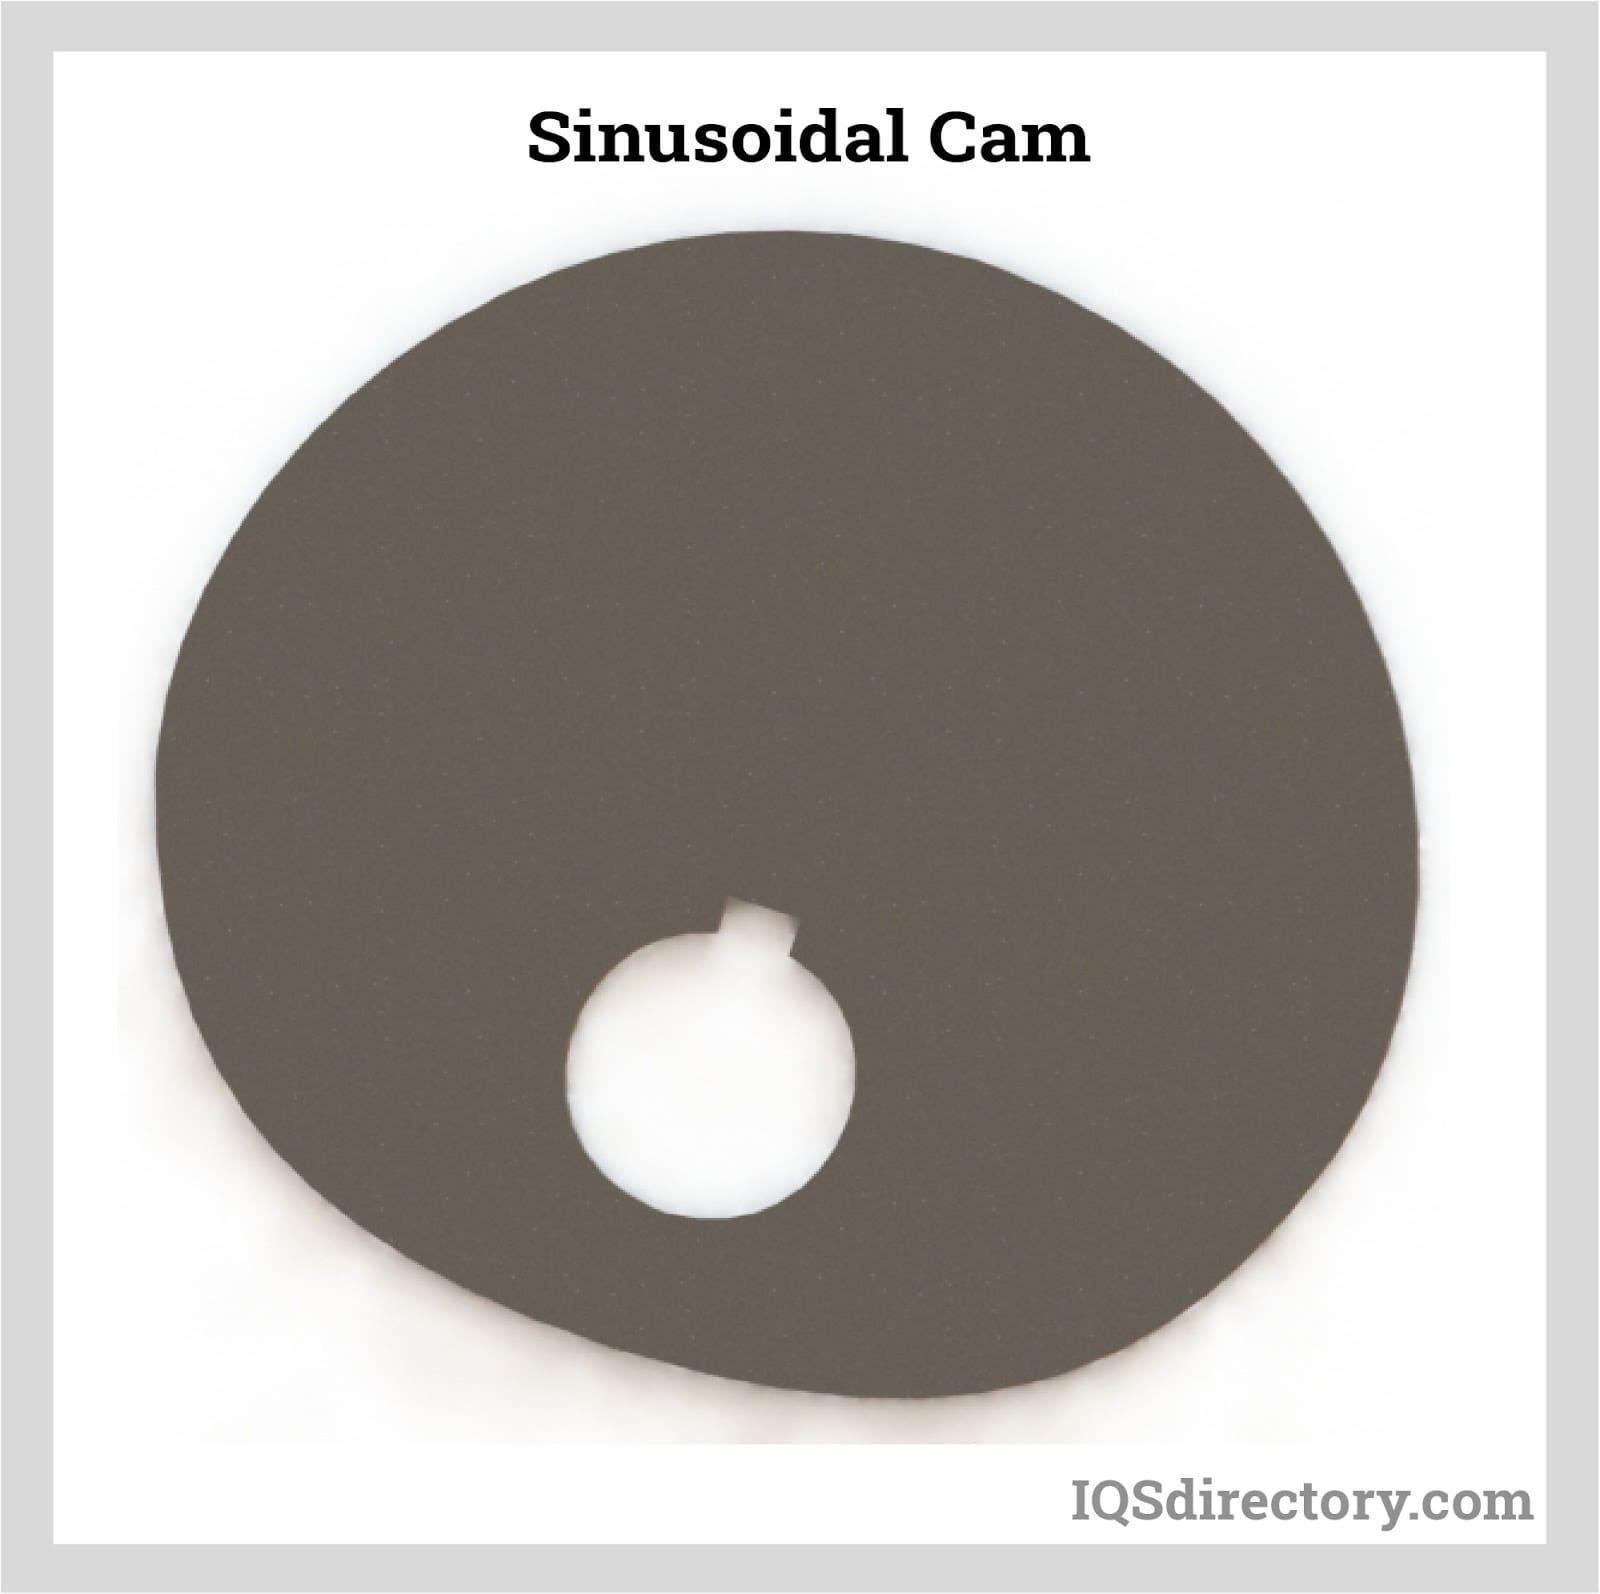 Sinusoidal Cam